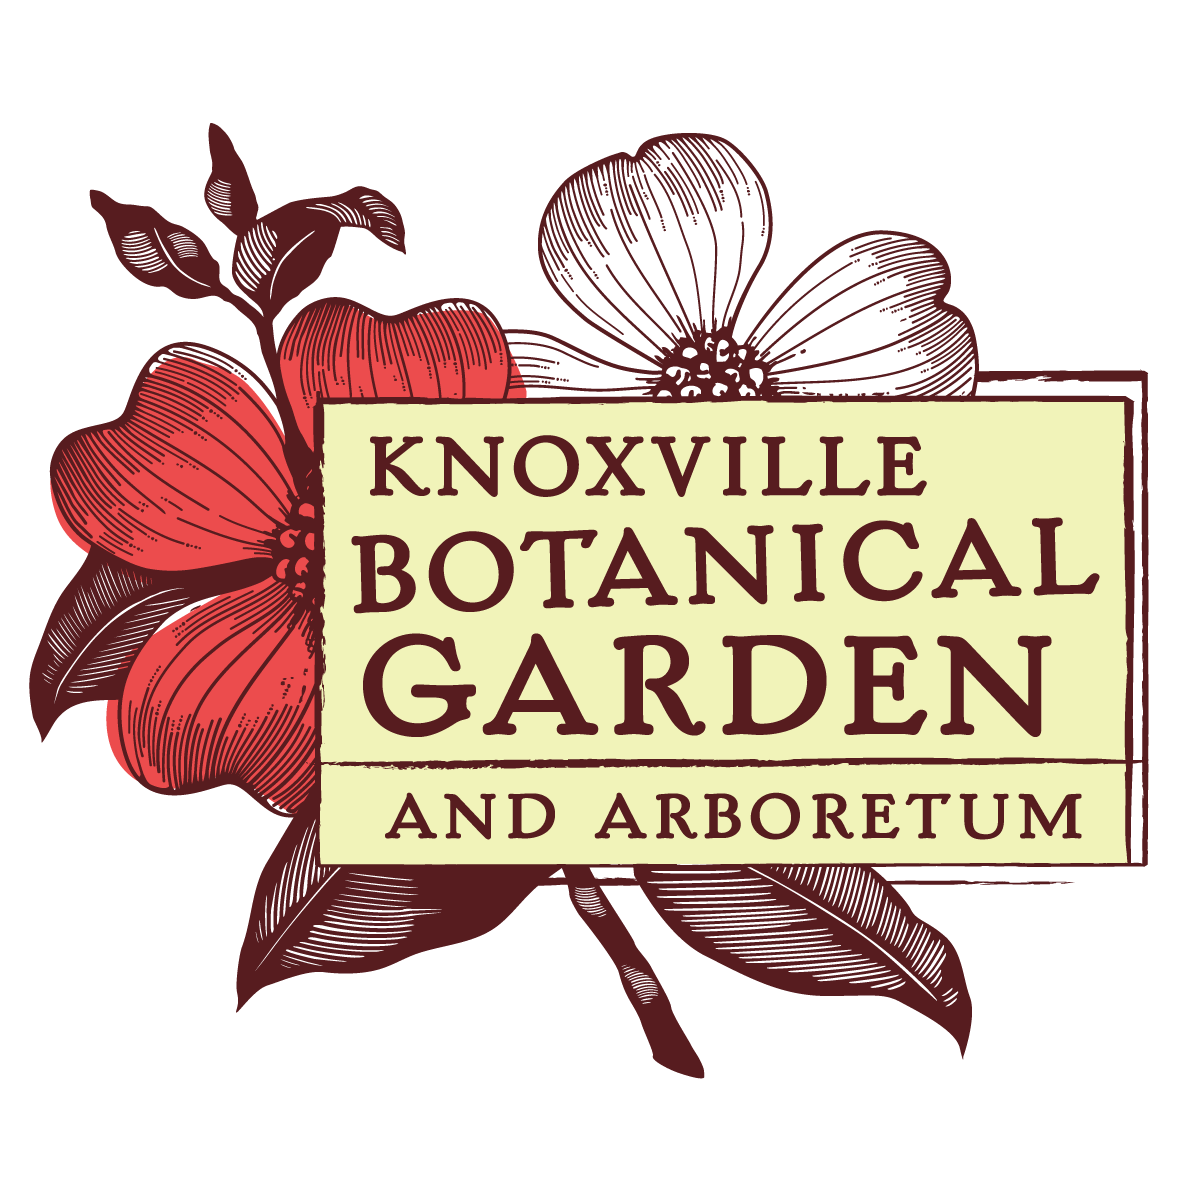 Garden clipart botanical garden. Home knoxville and arboretum